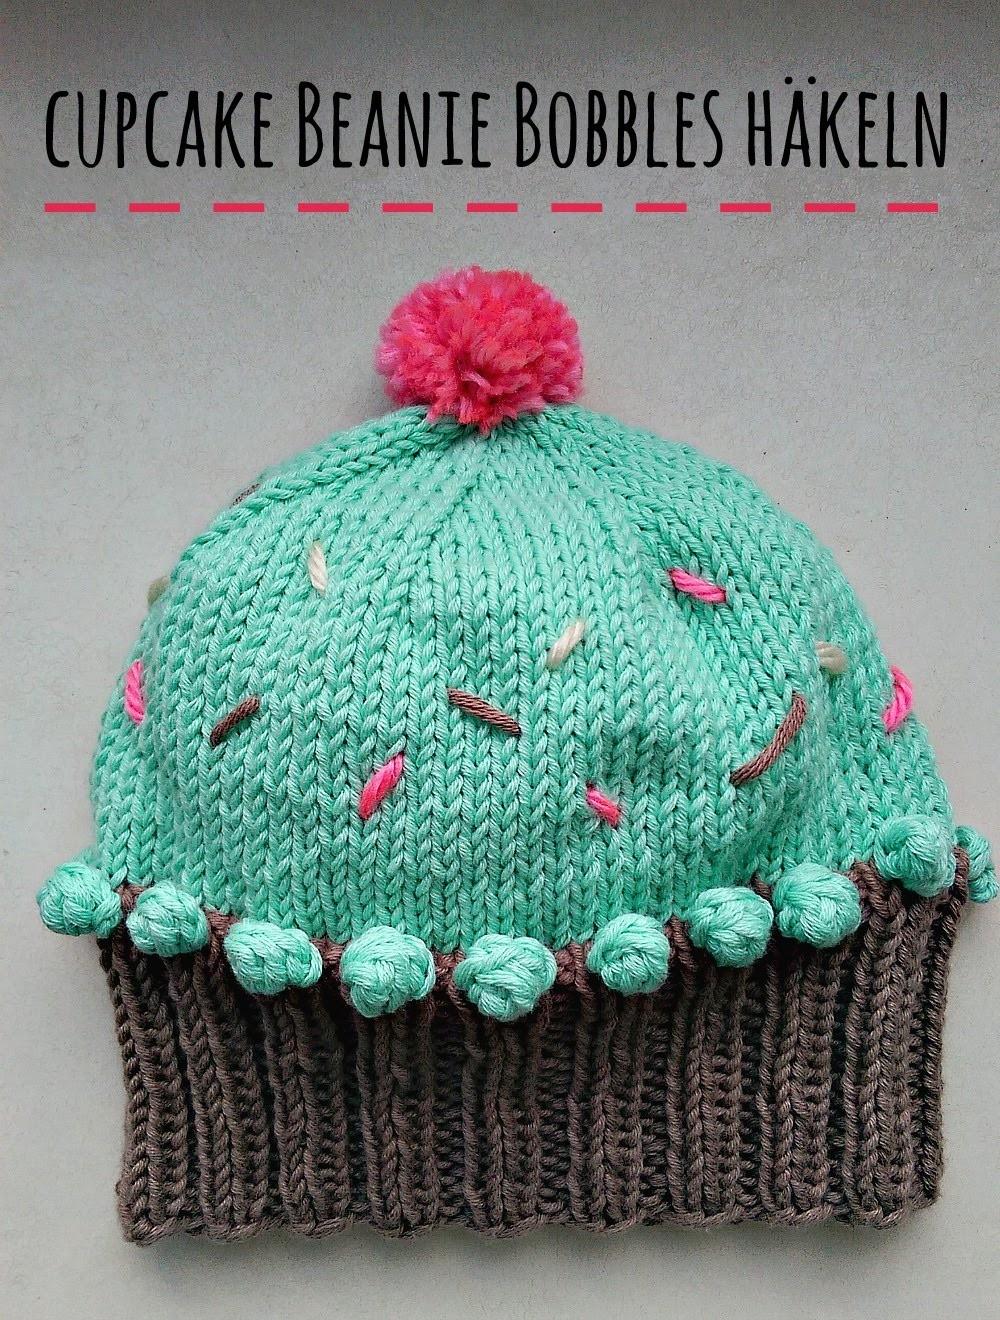 Cupcake Beanie: Bobbles häkeln